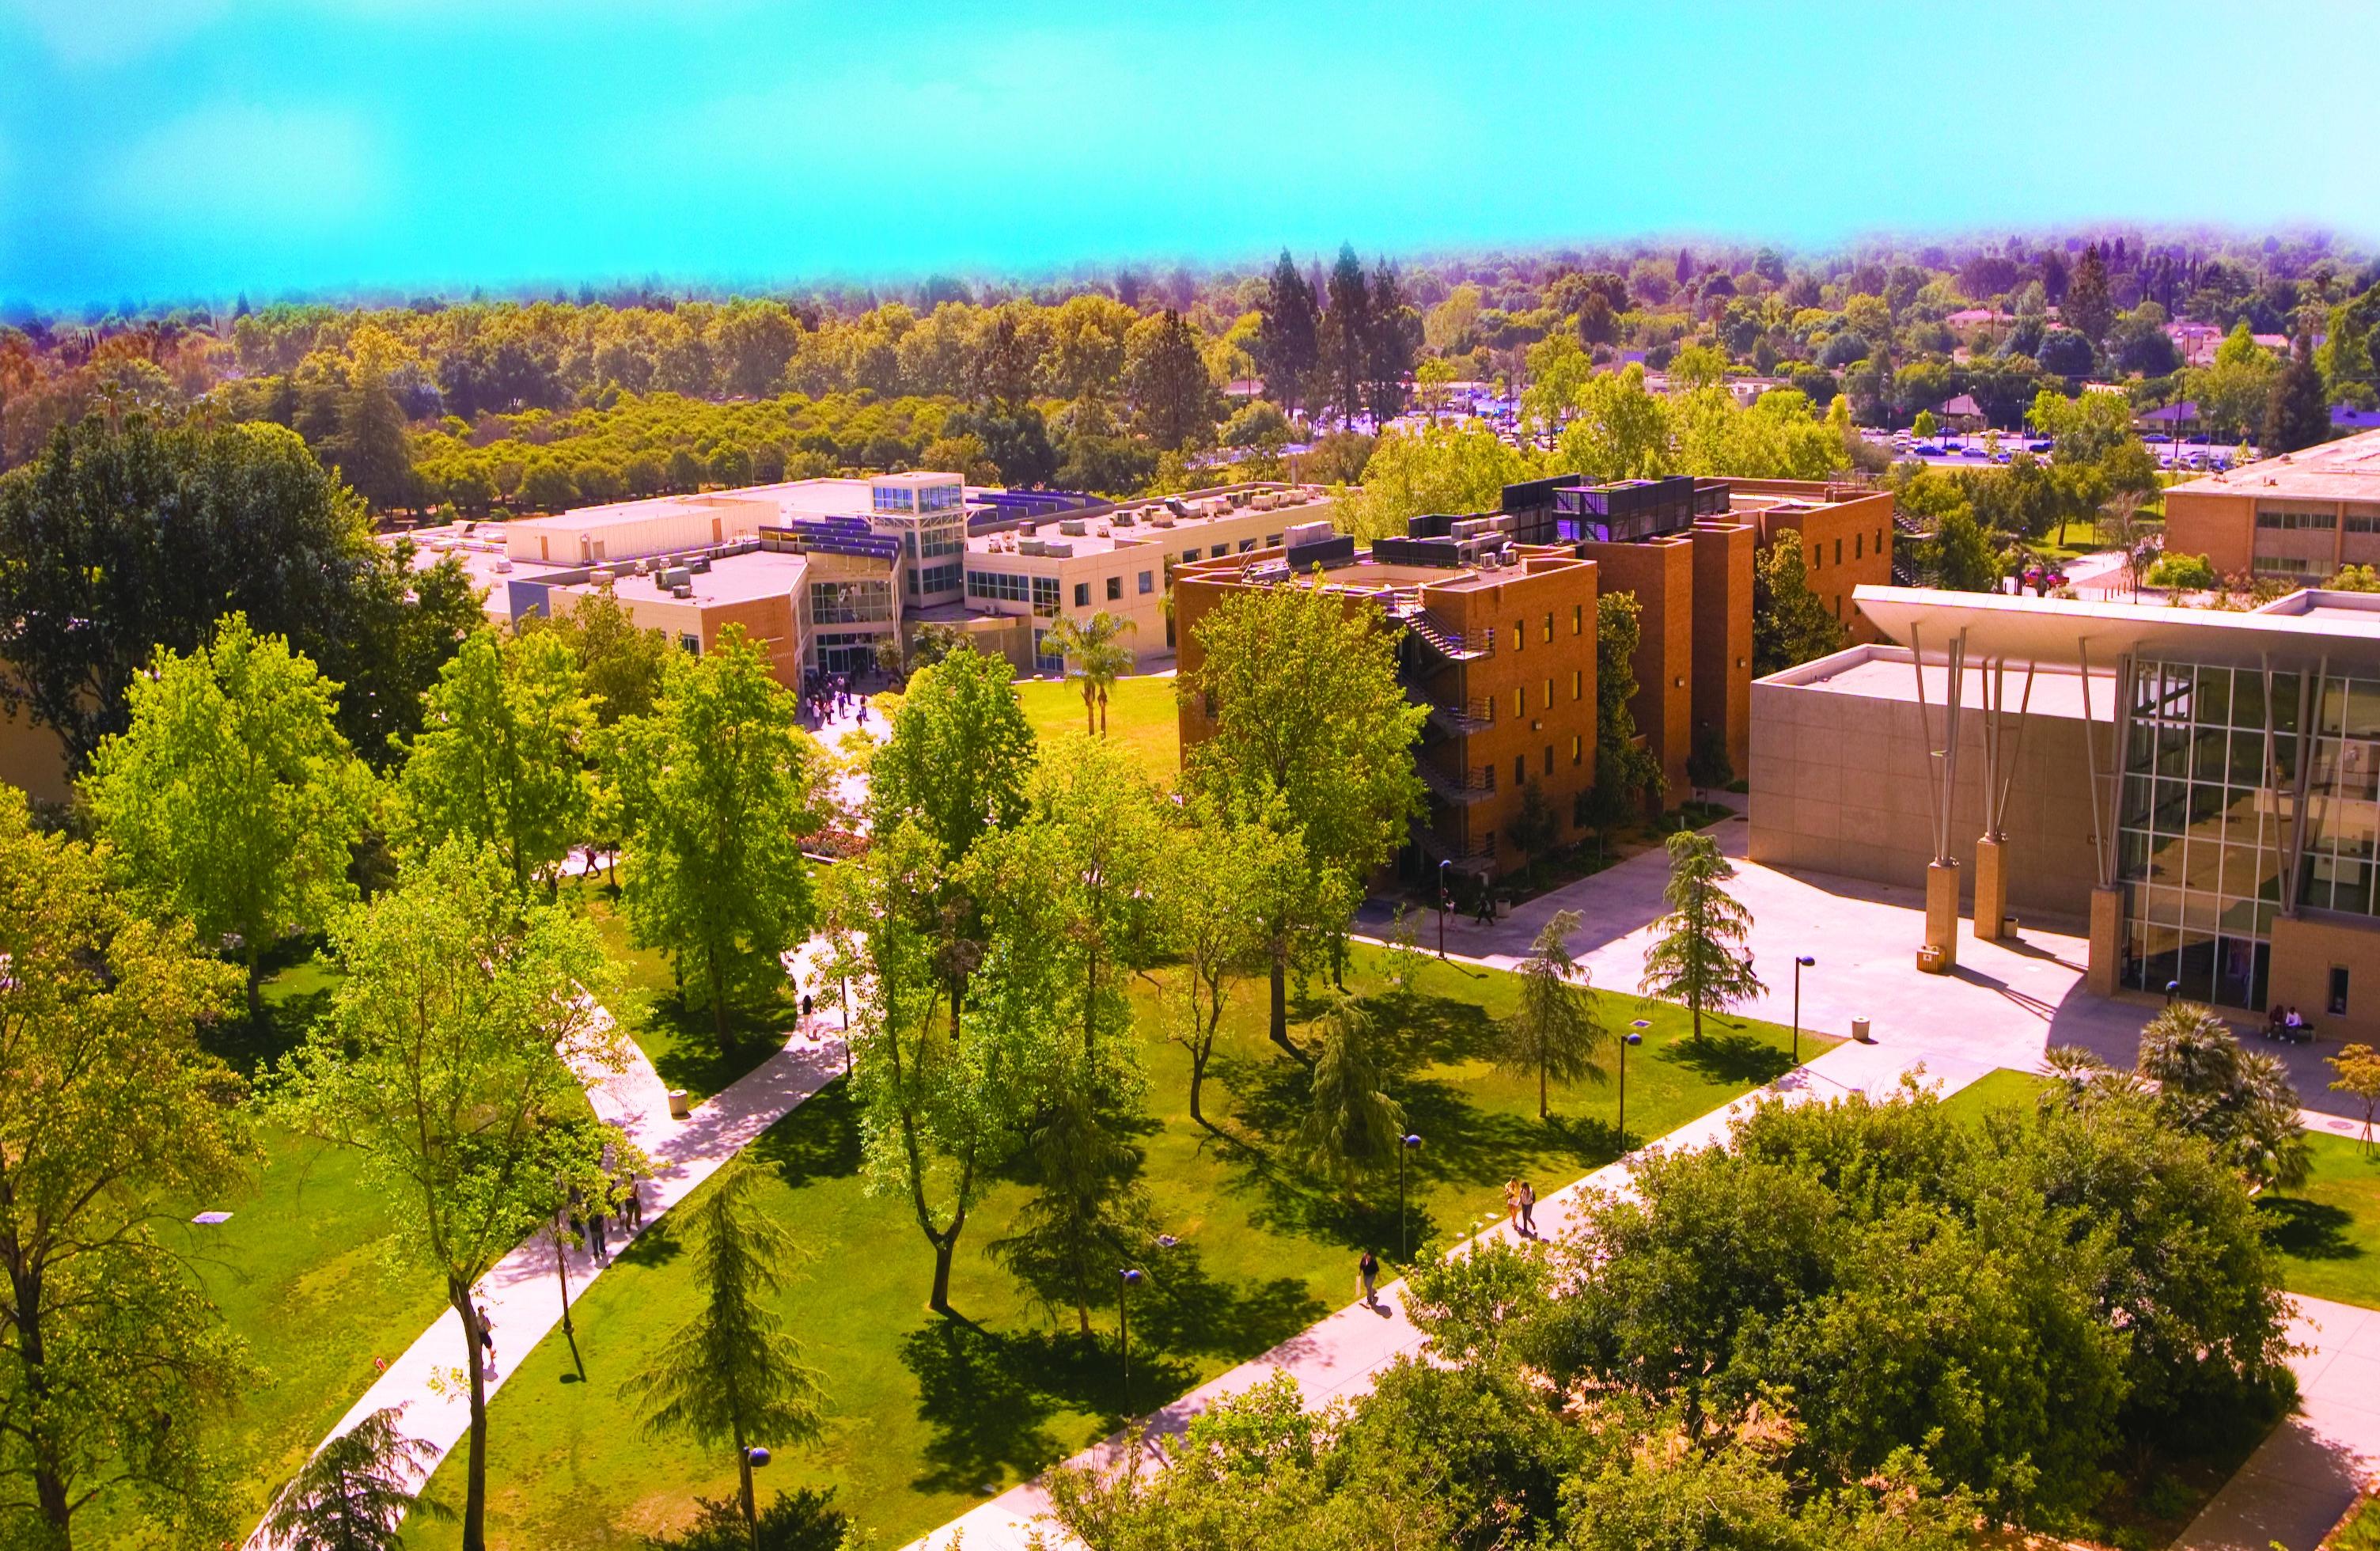 Pin By Yvonne Hess On Explore Csun Northridge California California State University Northridge California Dreamin